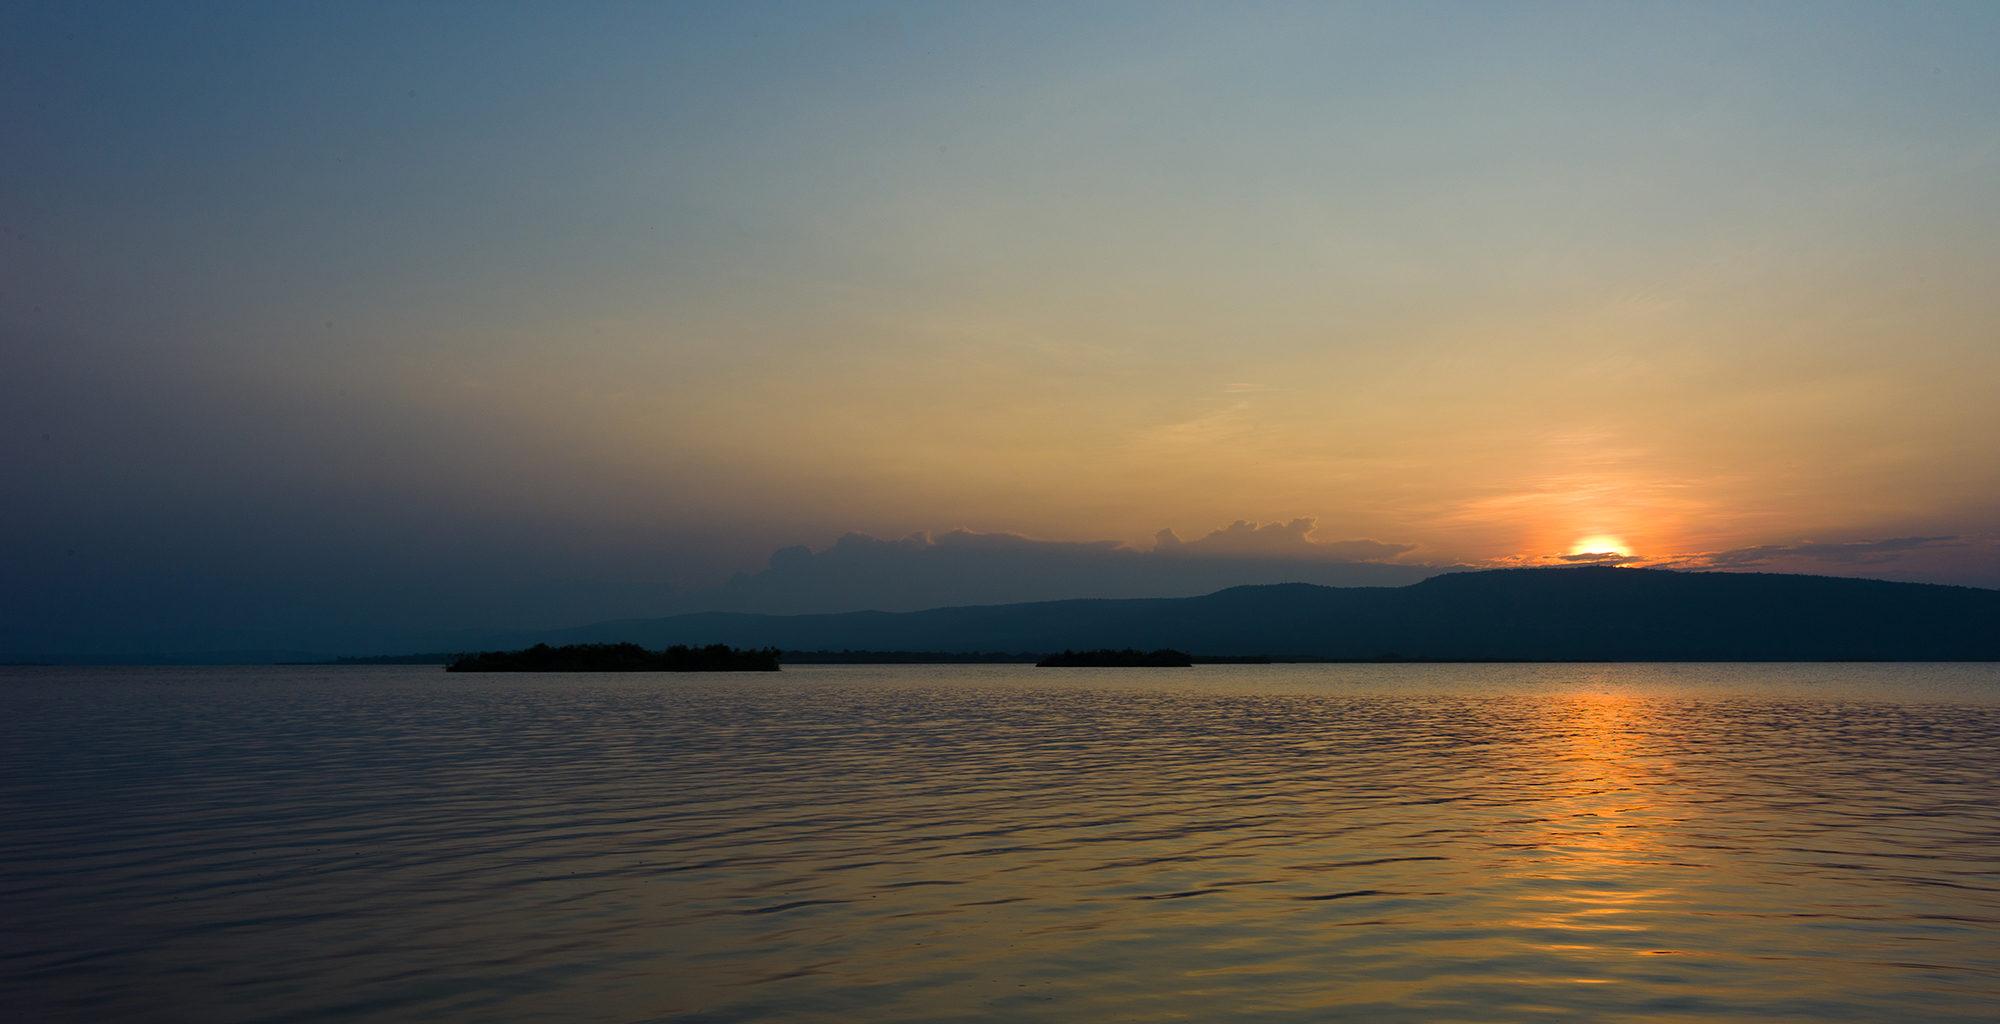 Rwanda-Akagera-National-Park-Sunset-Lake